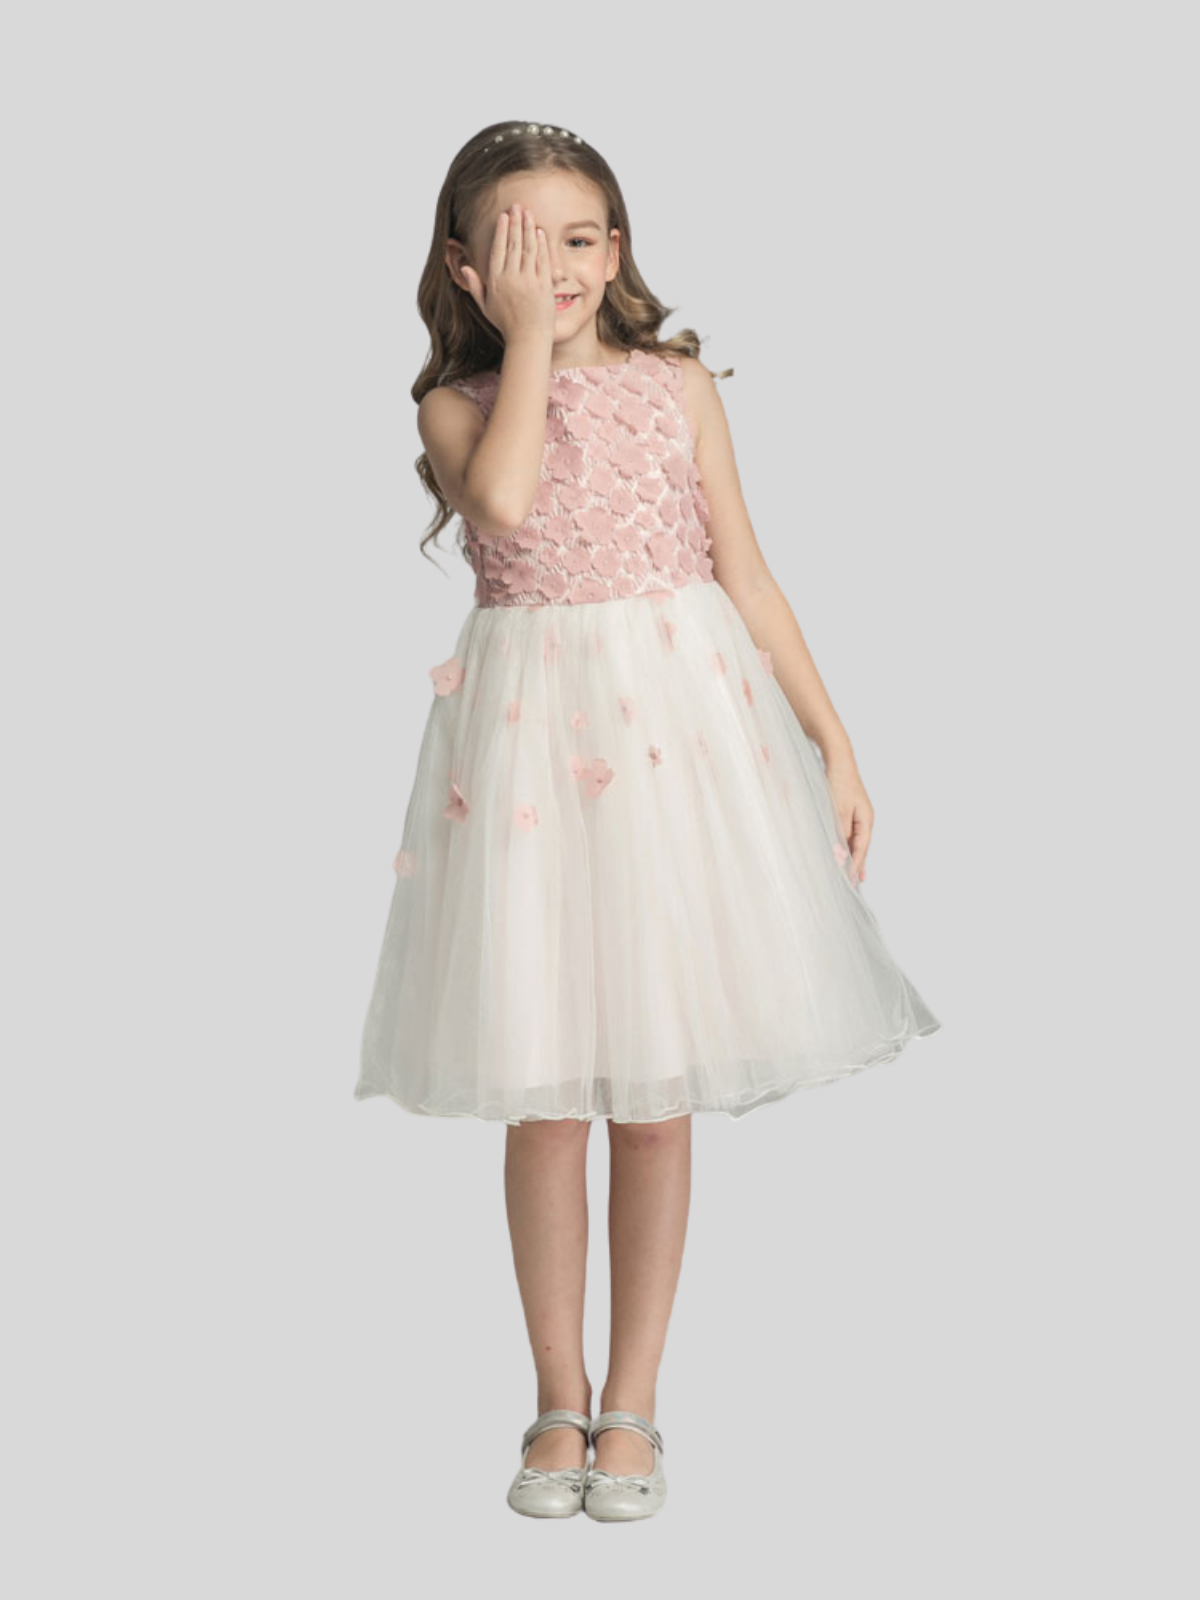 Emma Tulle Skirt Flower Girl Dress with Blush Pink Flowers